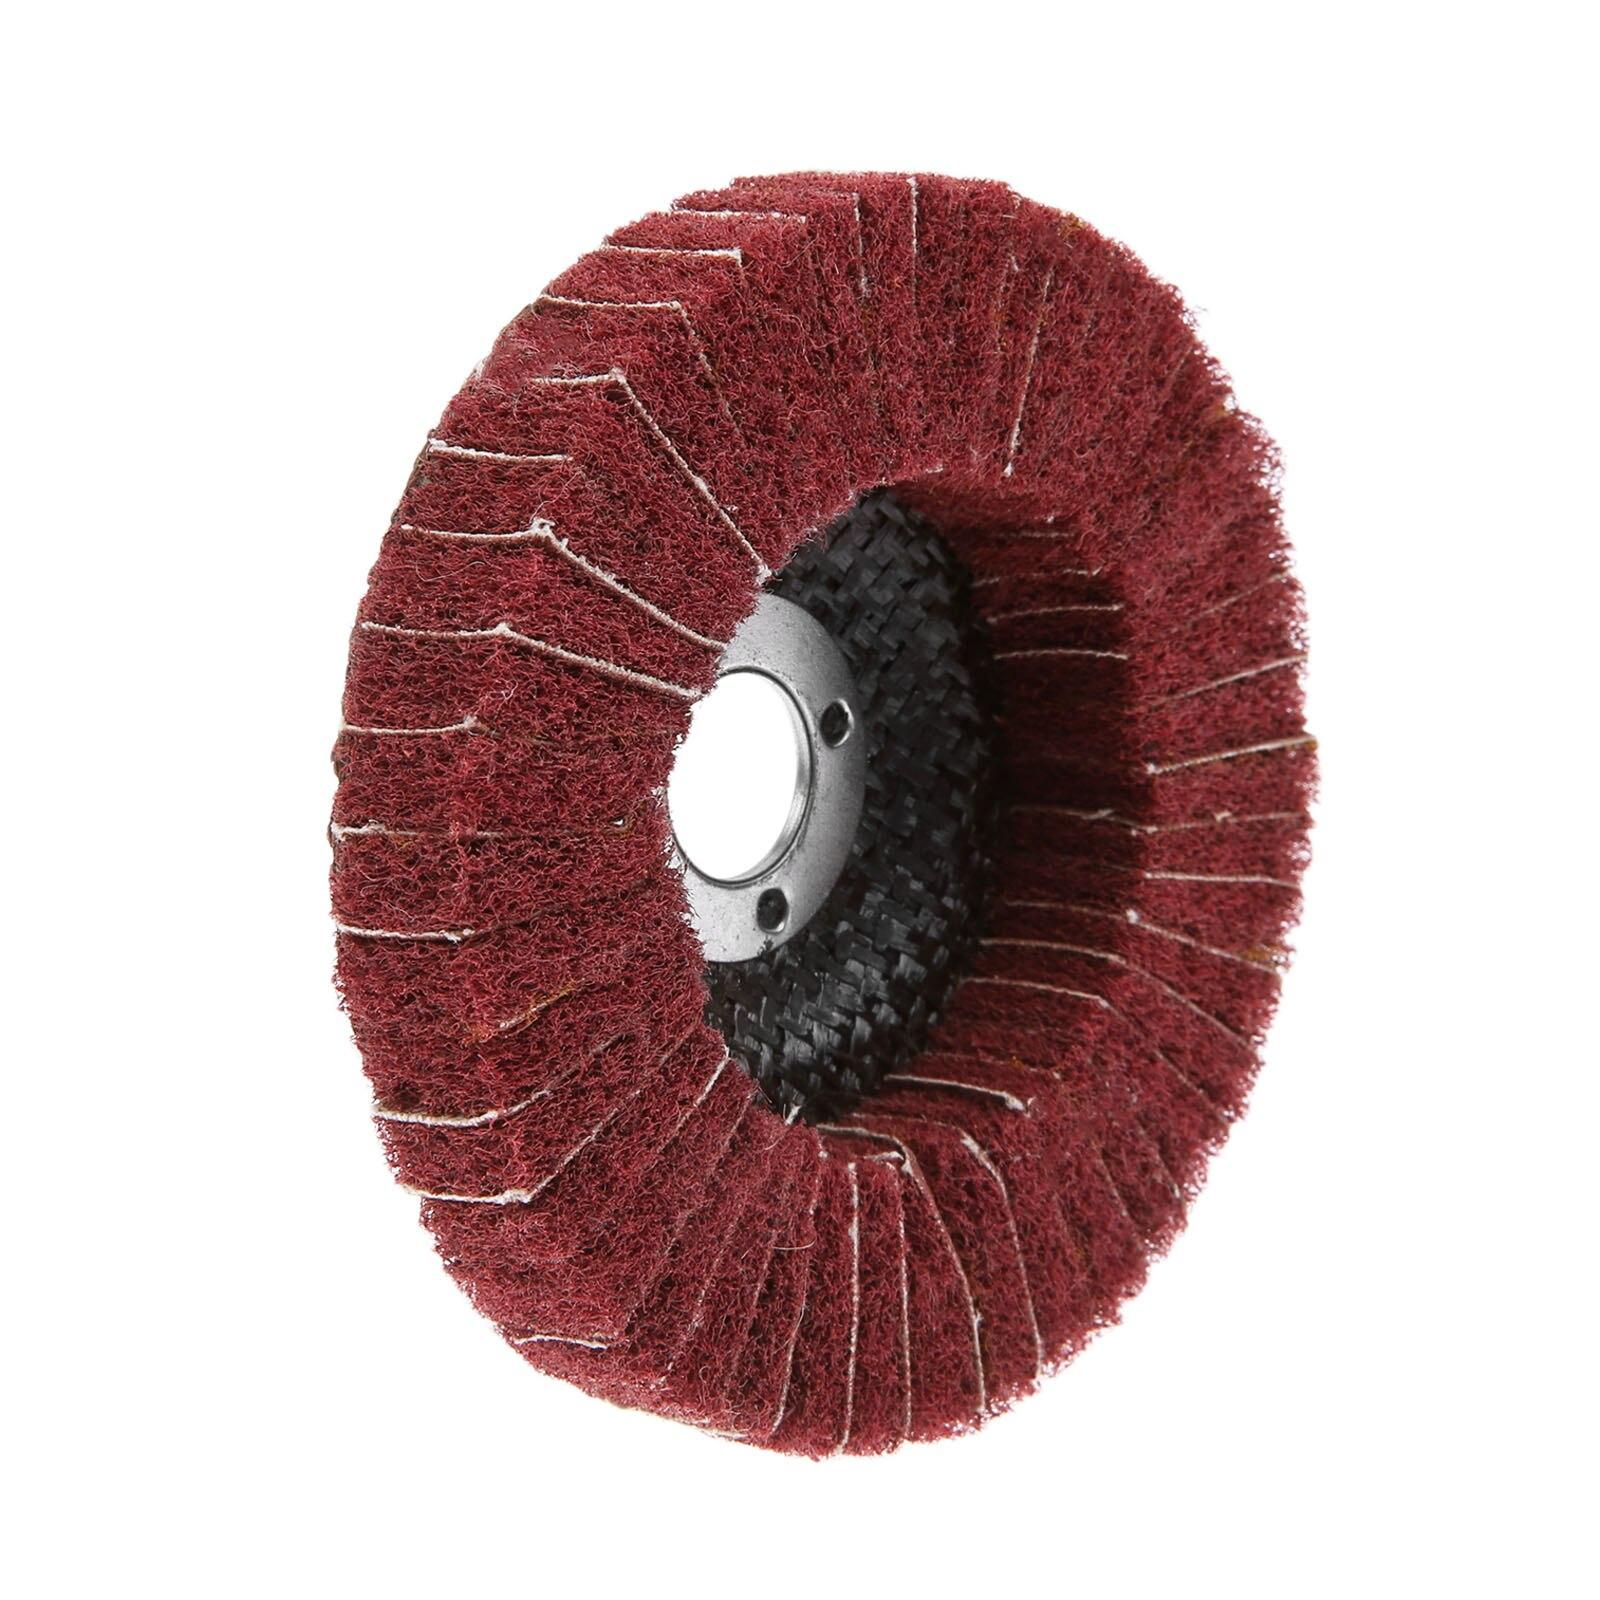 Yasumai Mounted Wool Felt Polishing Buff wheels with Mandrel for Rotary Tools 2.35mm Shank Pack of 20